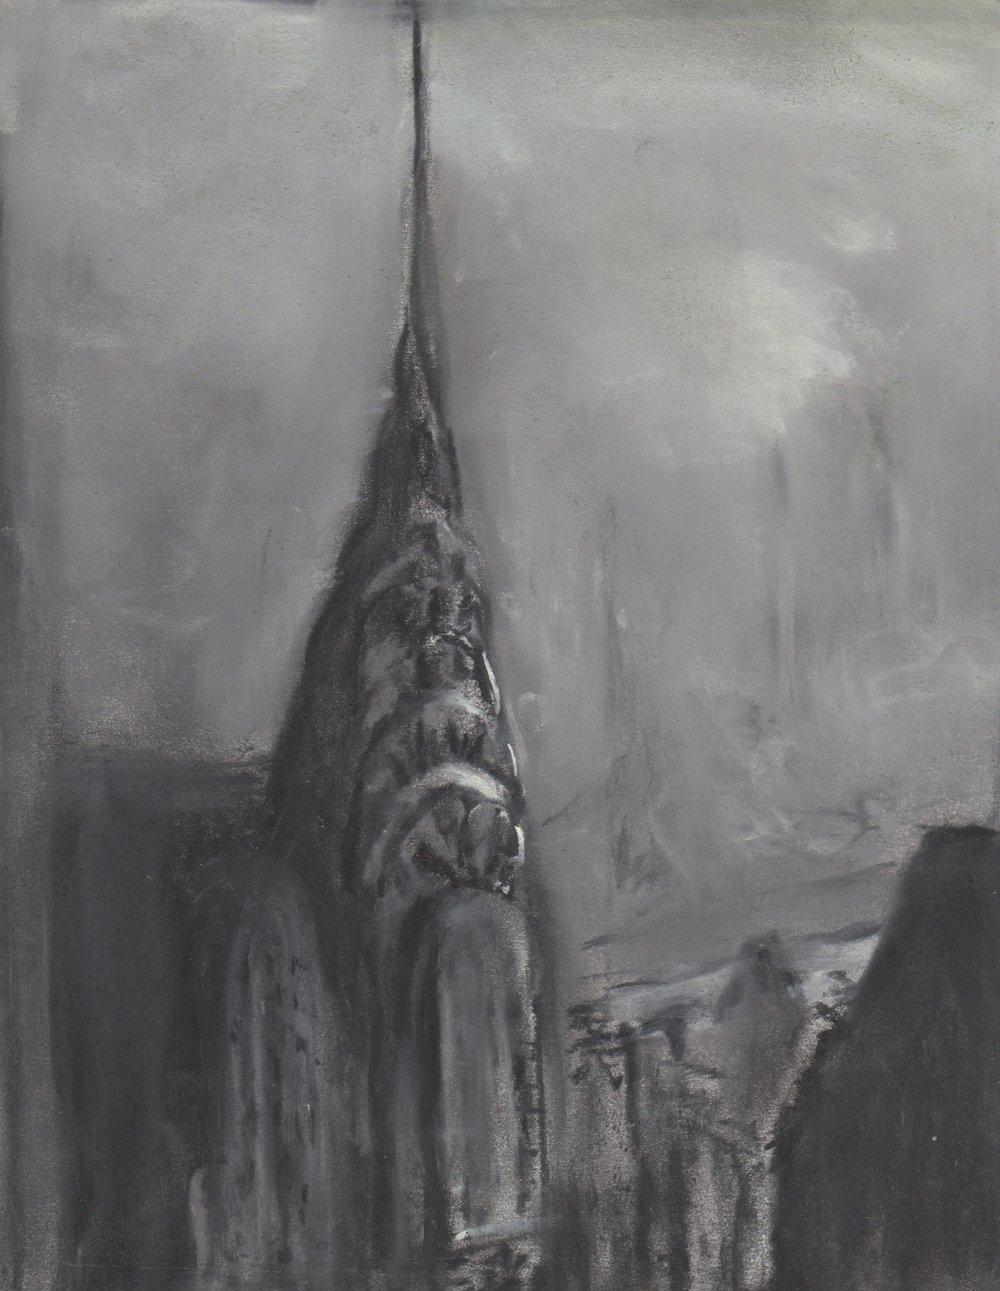 Chrysler Building, charcoal, 8x10, $40